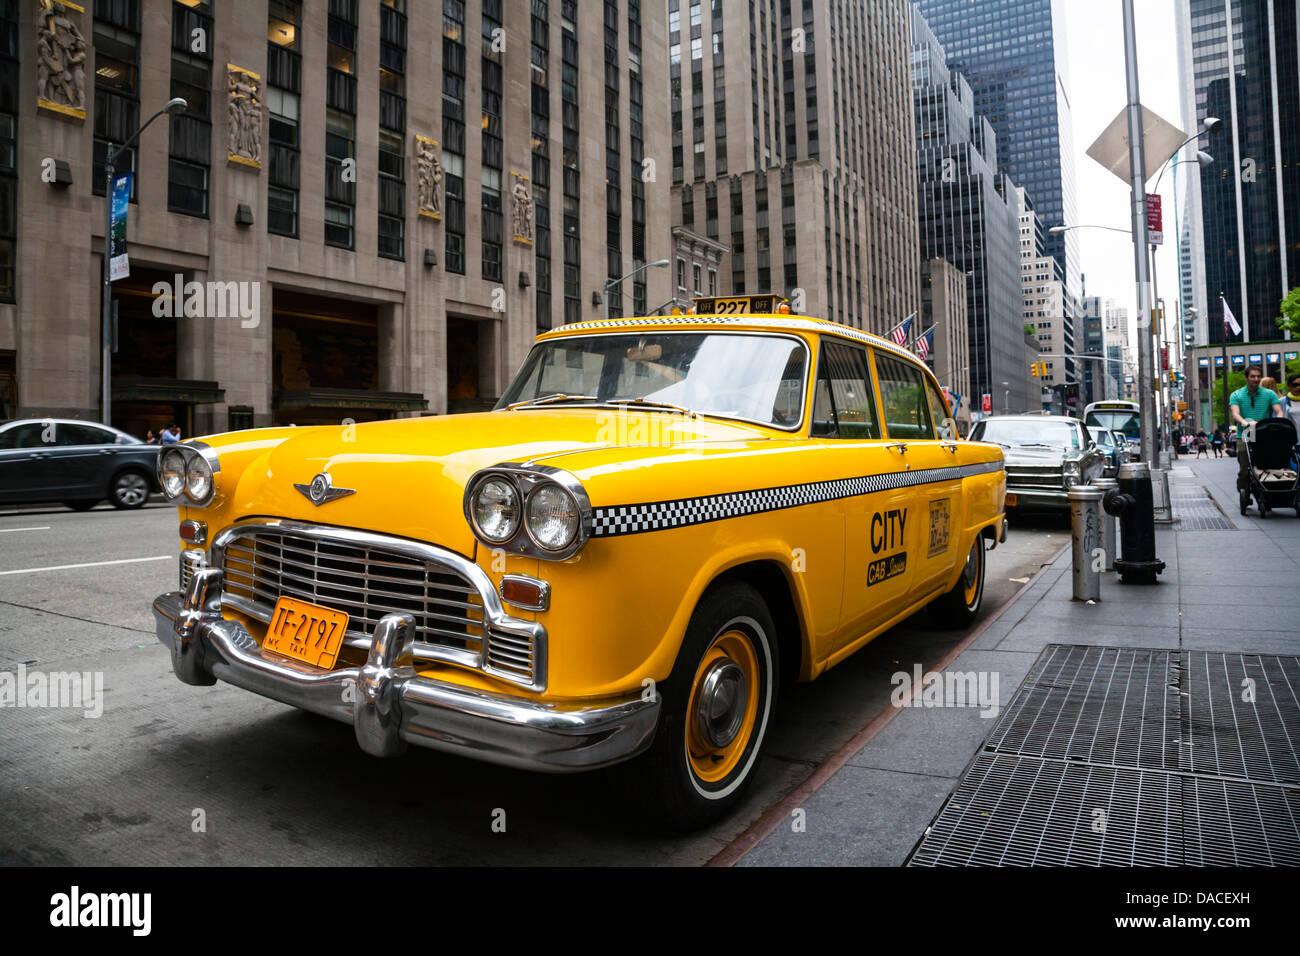 Vintage yellow New York taxi, NYC, USA Stock Photo - Alamy